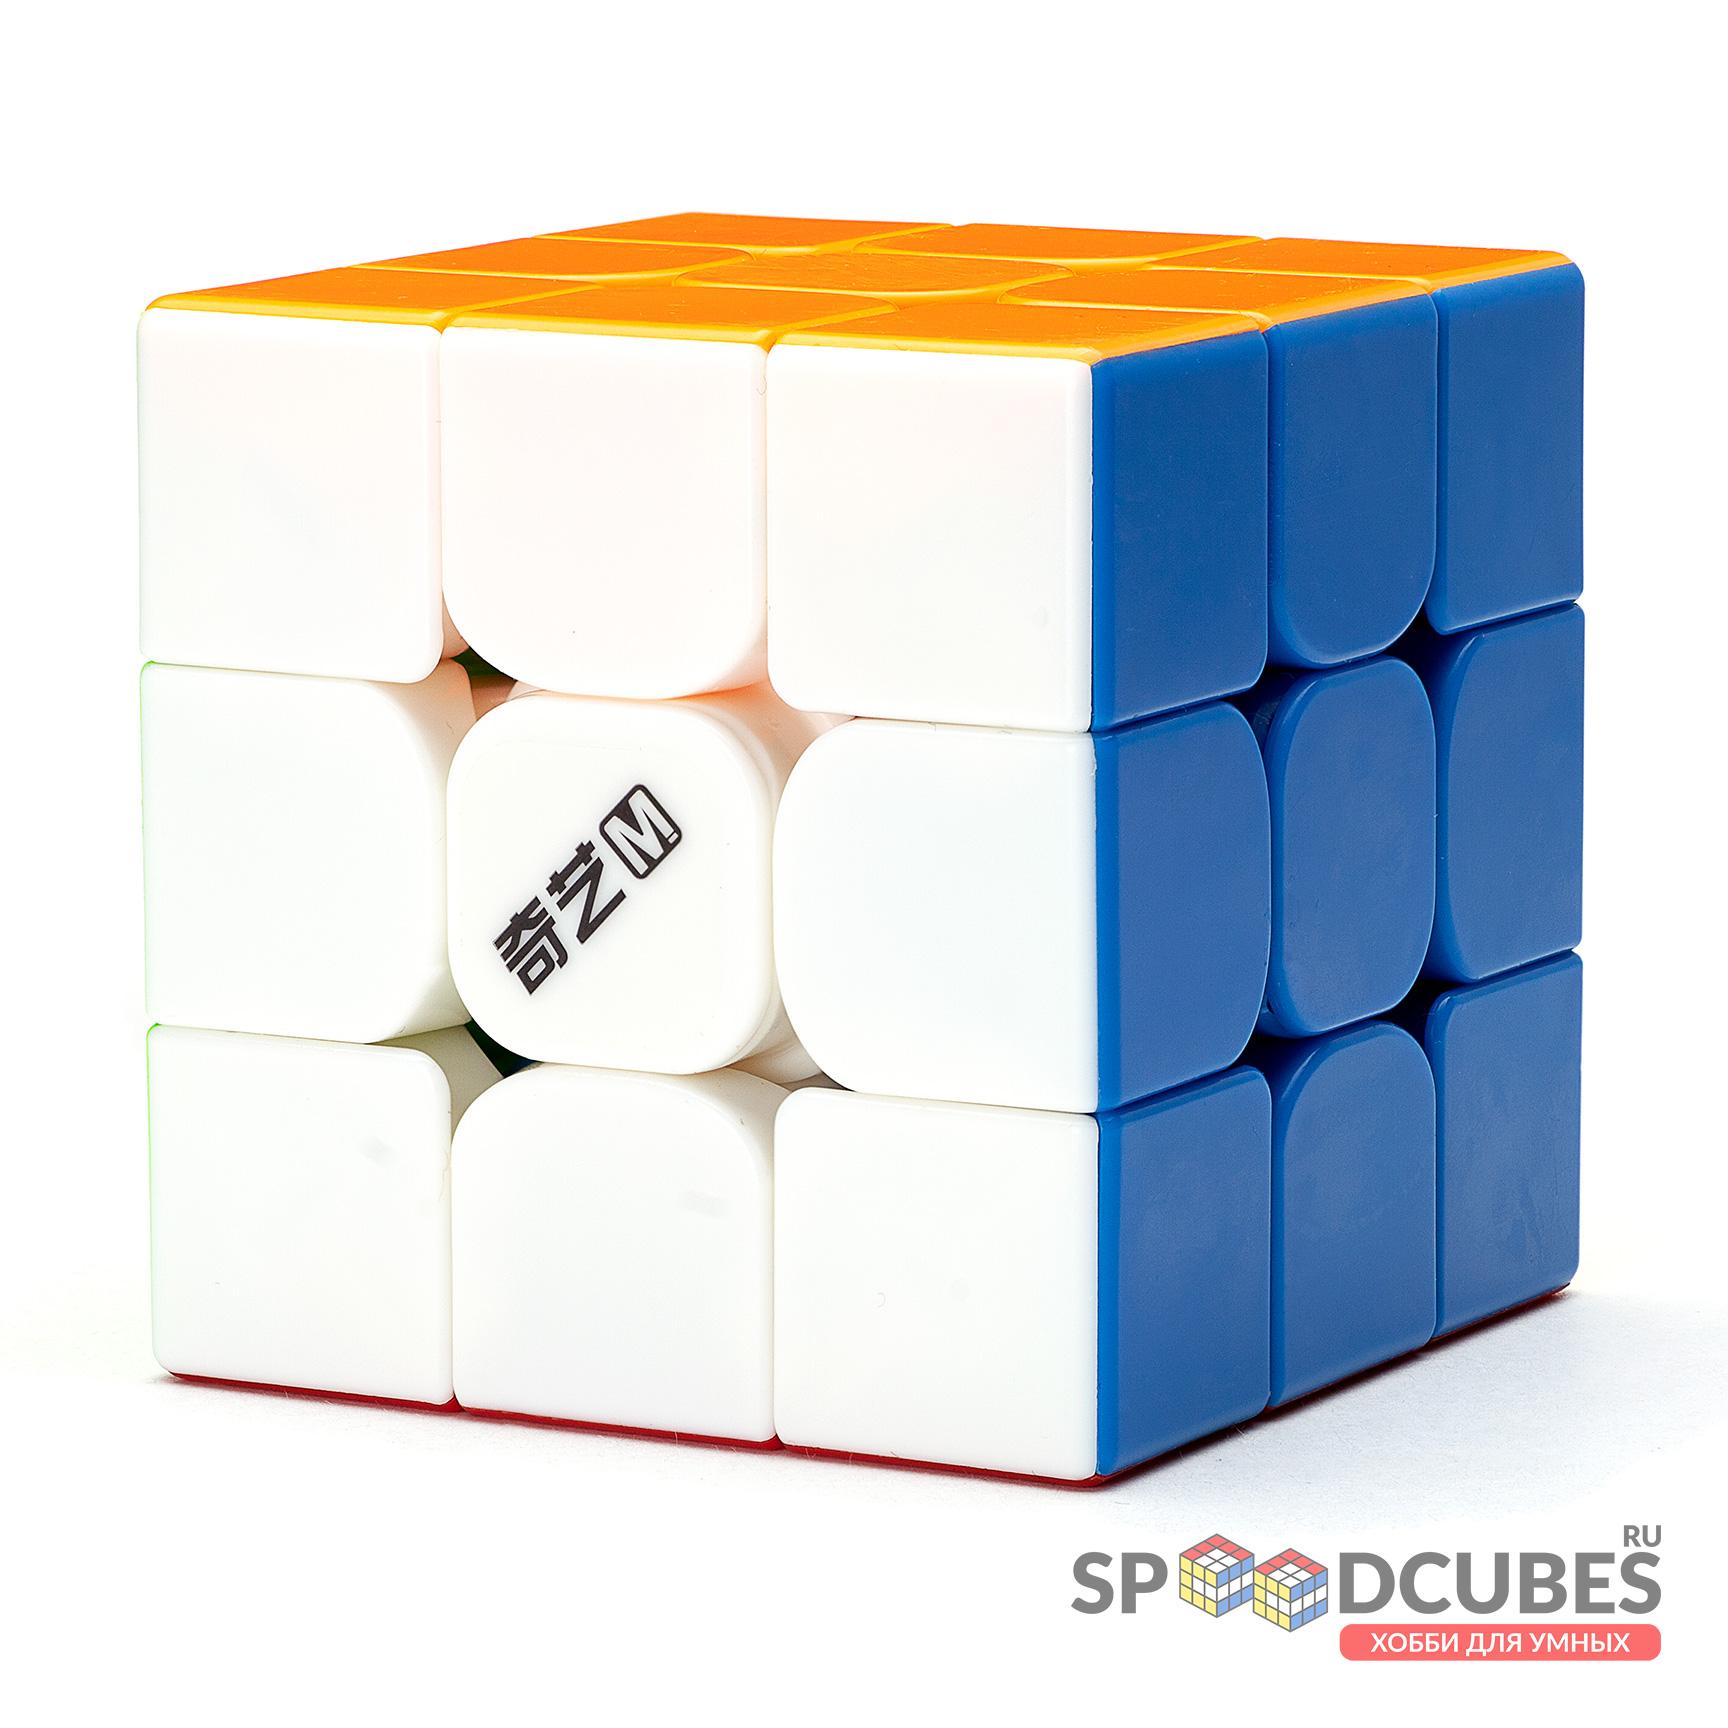 QiYi (MoFangGe) MS 3x3x3 Magnetic